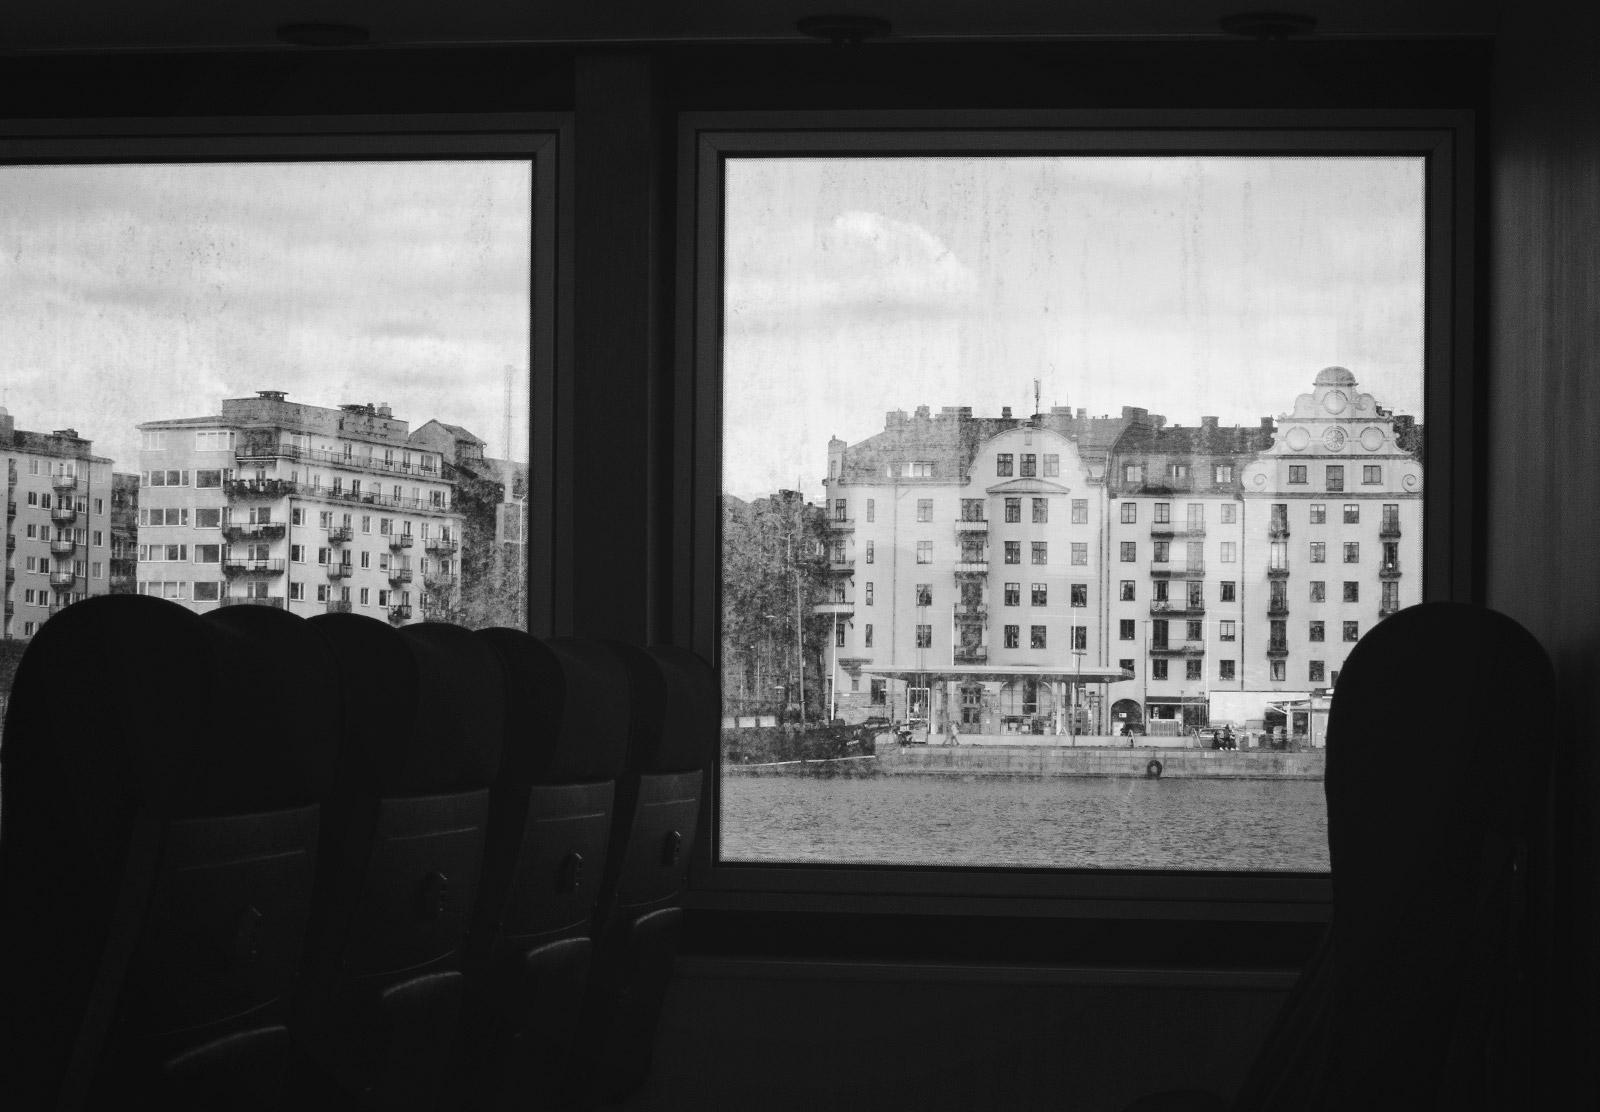 City through a window